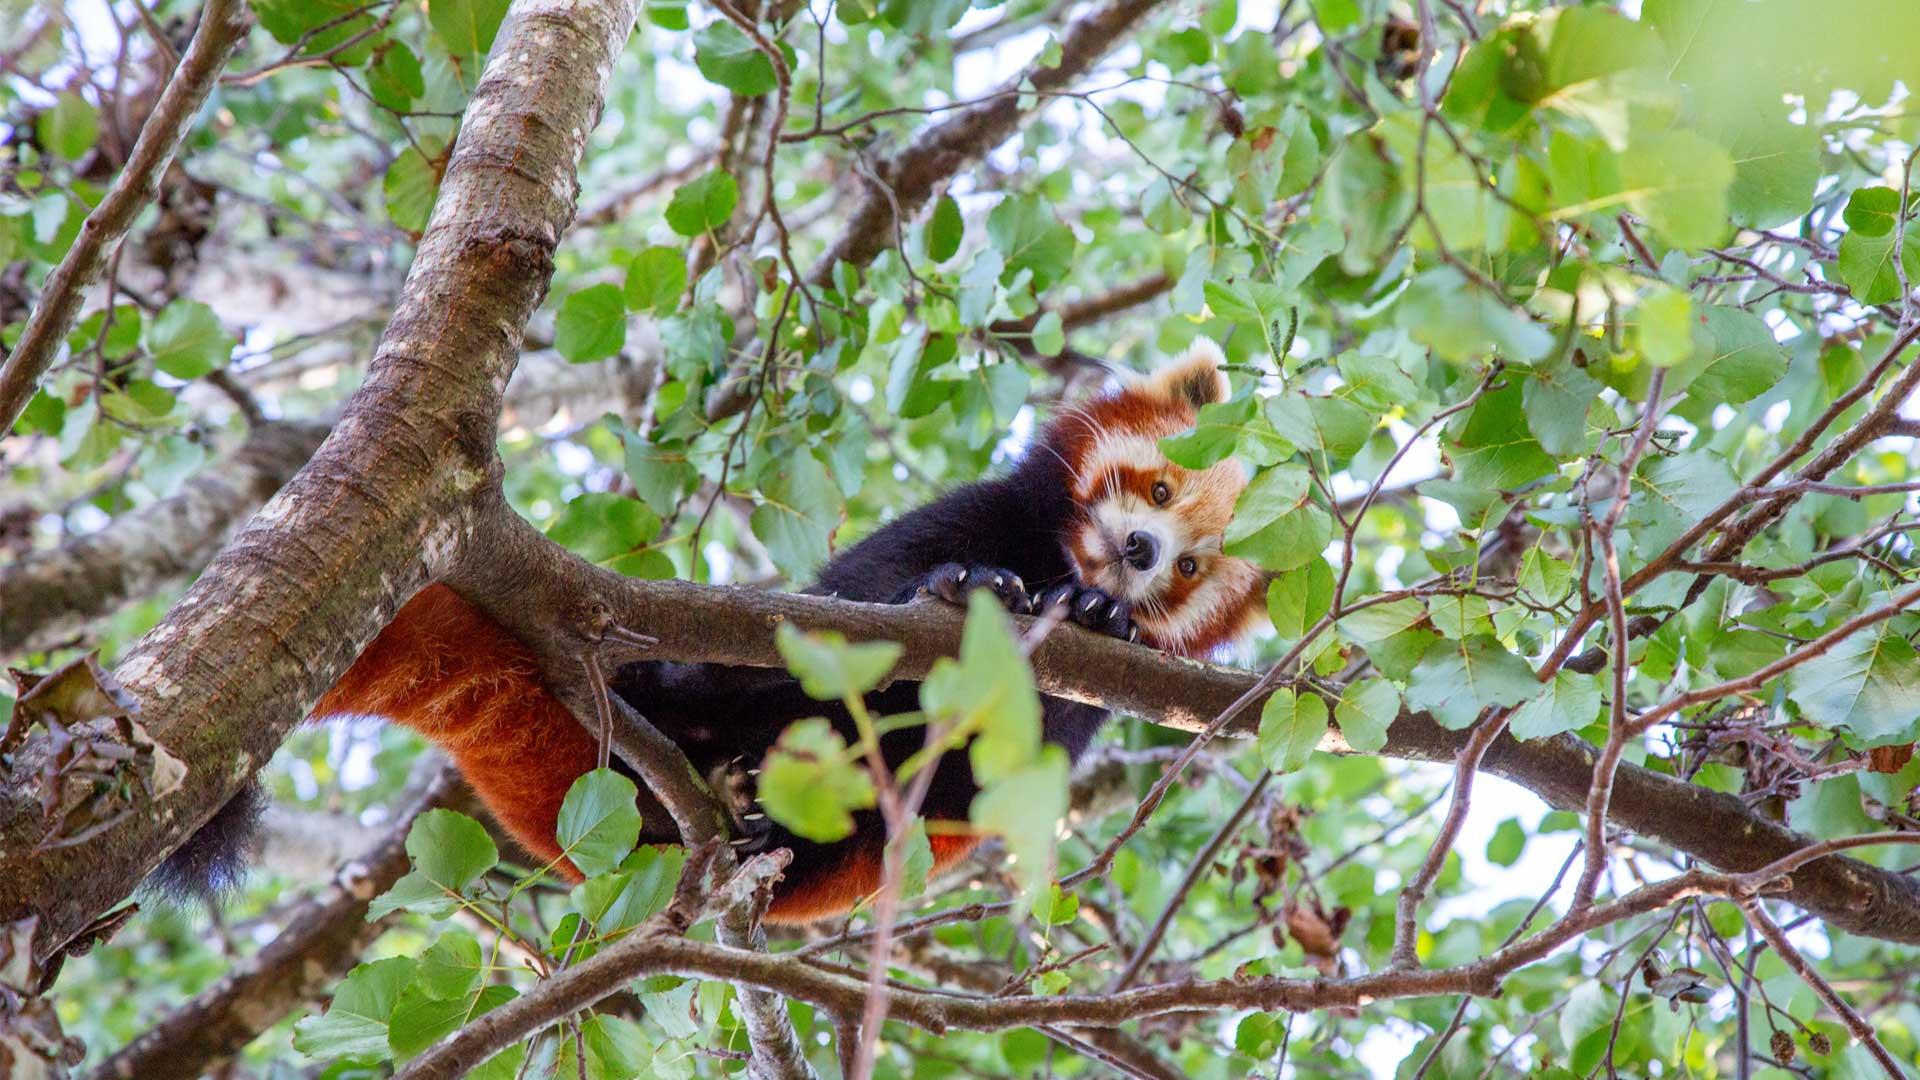 https://rfacdn.nz/zoo/assets/media/red-panda-gallery-8.jpg